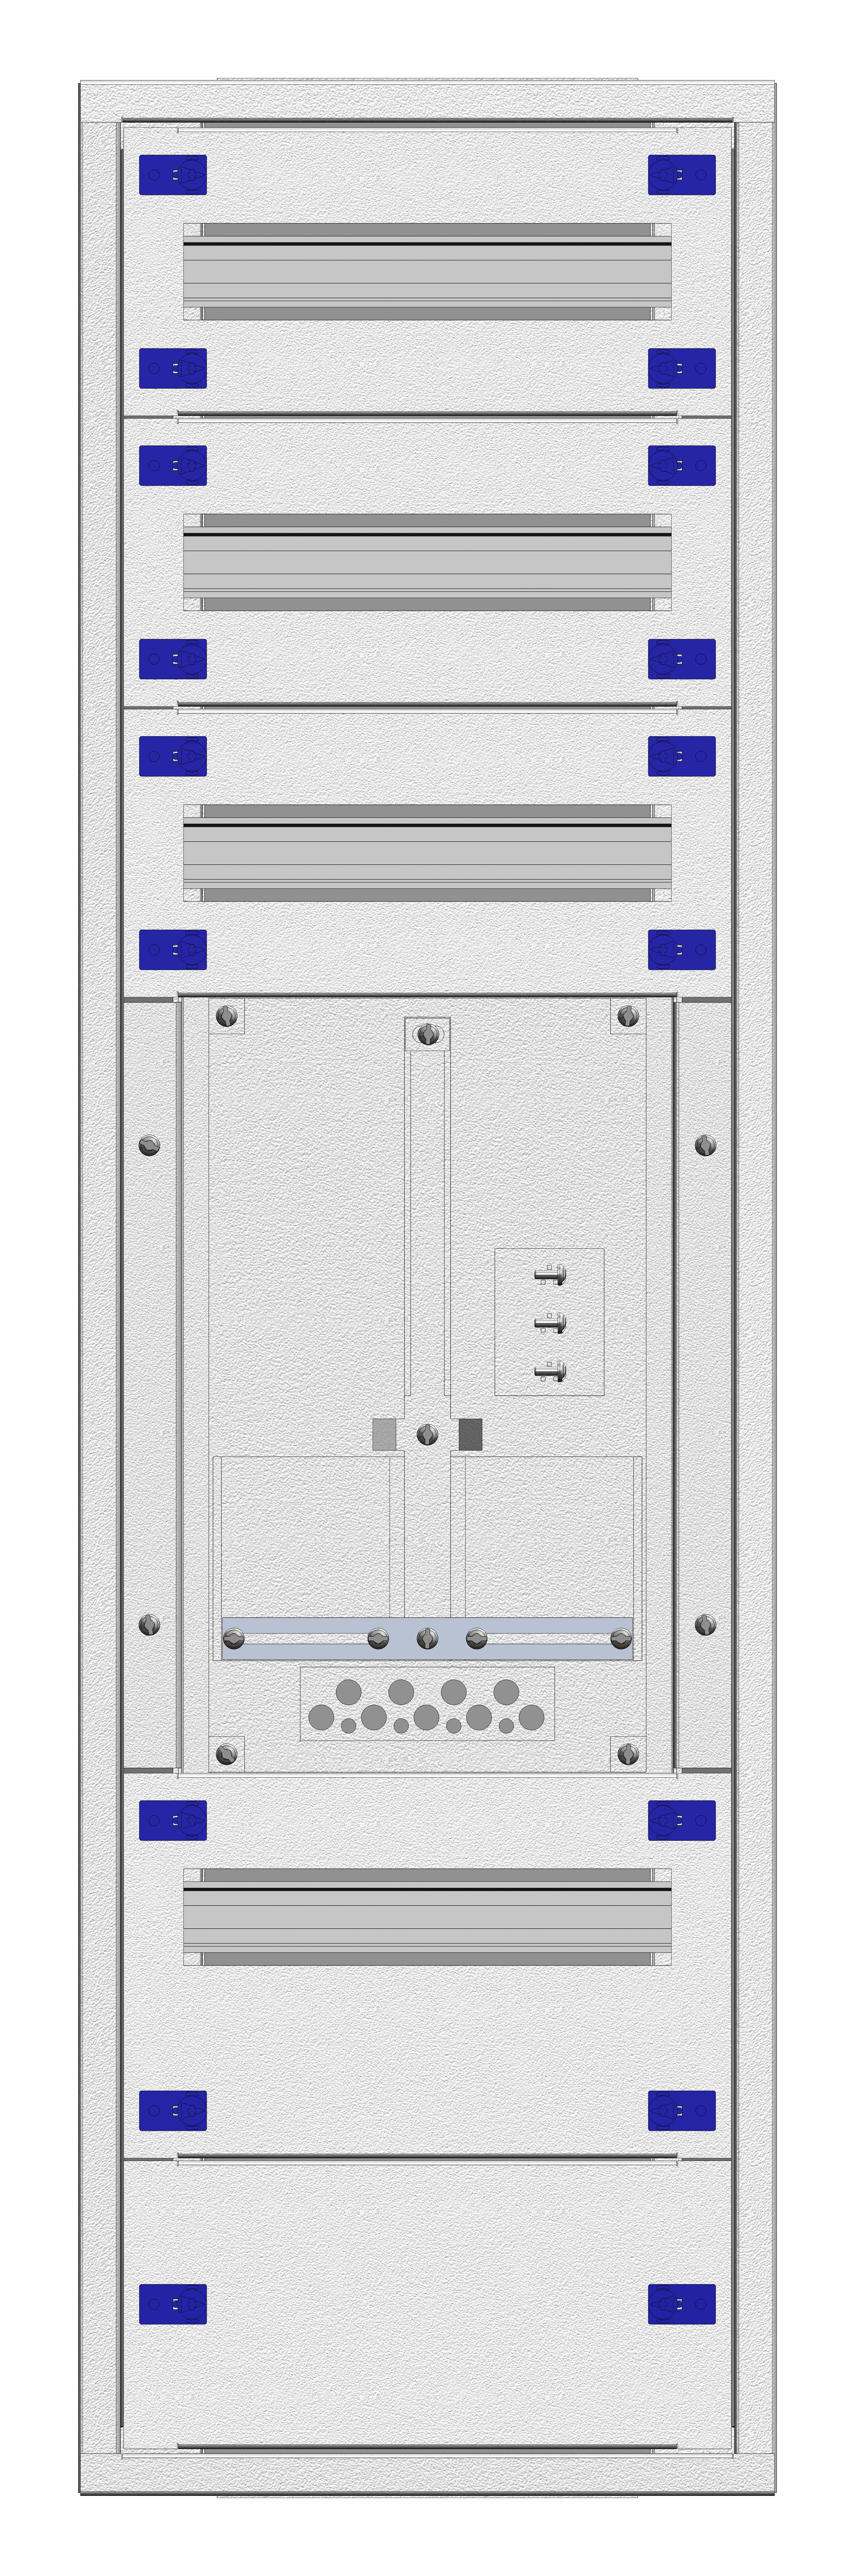 1 Stk Aufputz-Zählerverteiler 1A-24E/OOE 1ZP, H1195B380T250mm IL160124OS